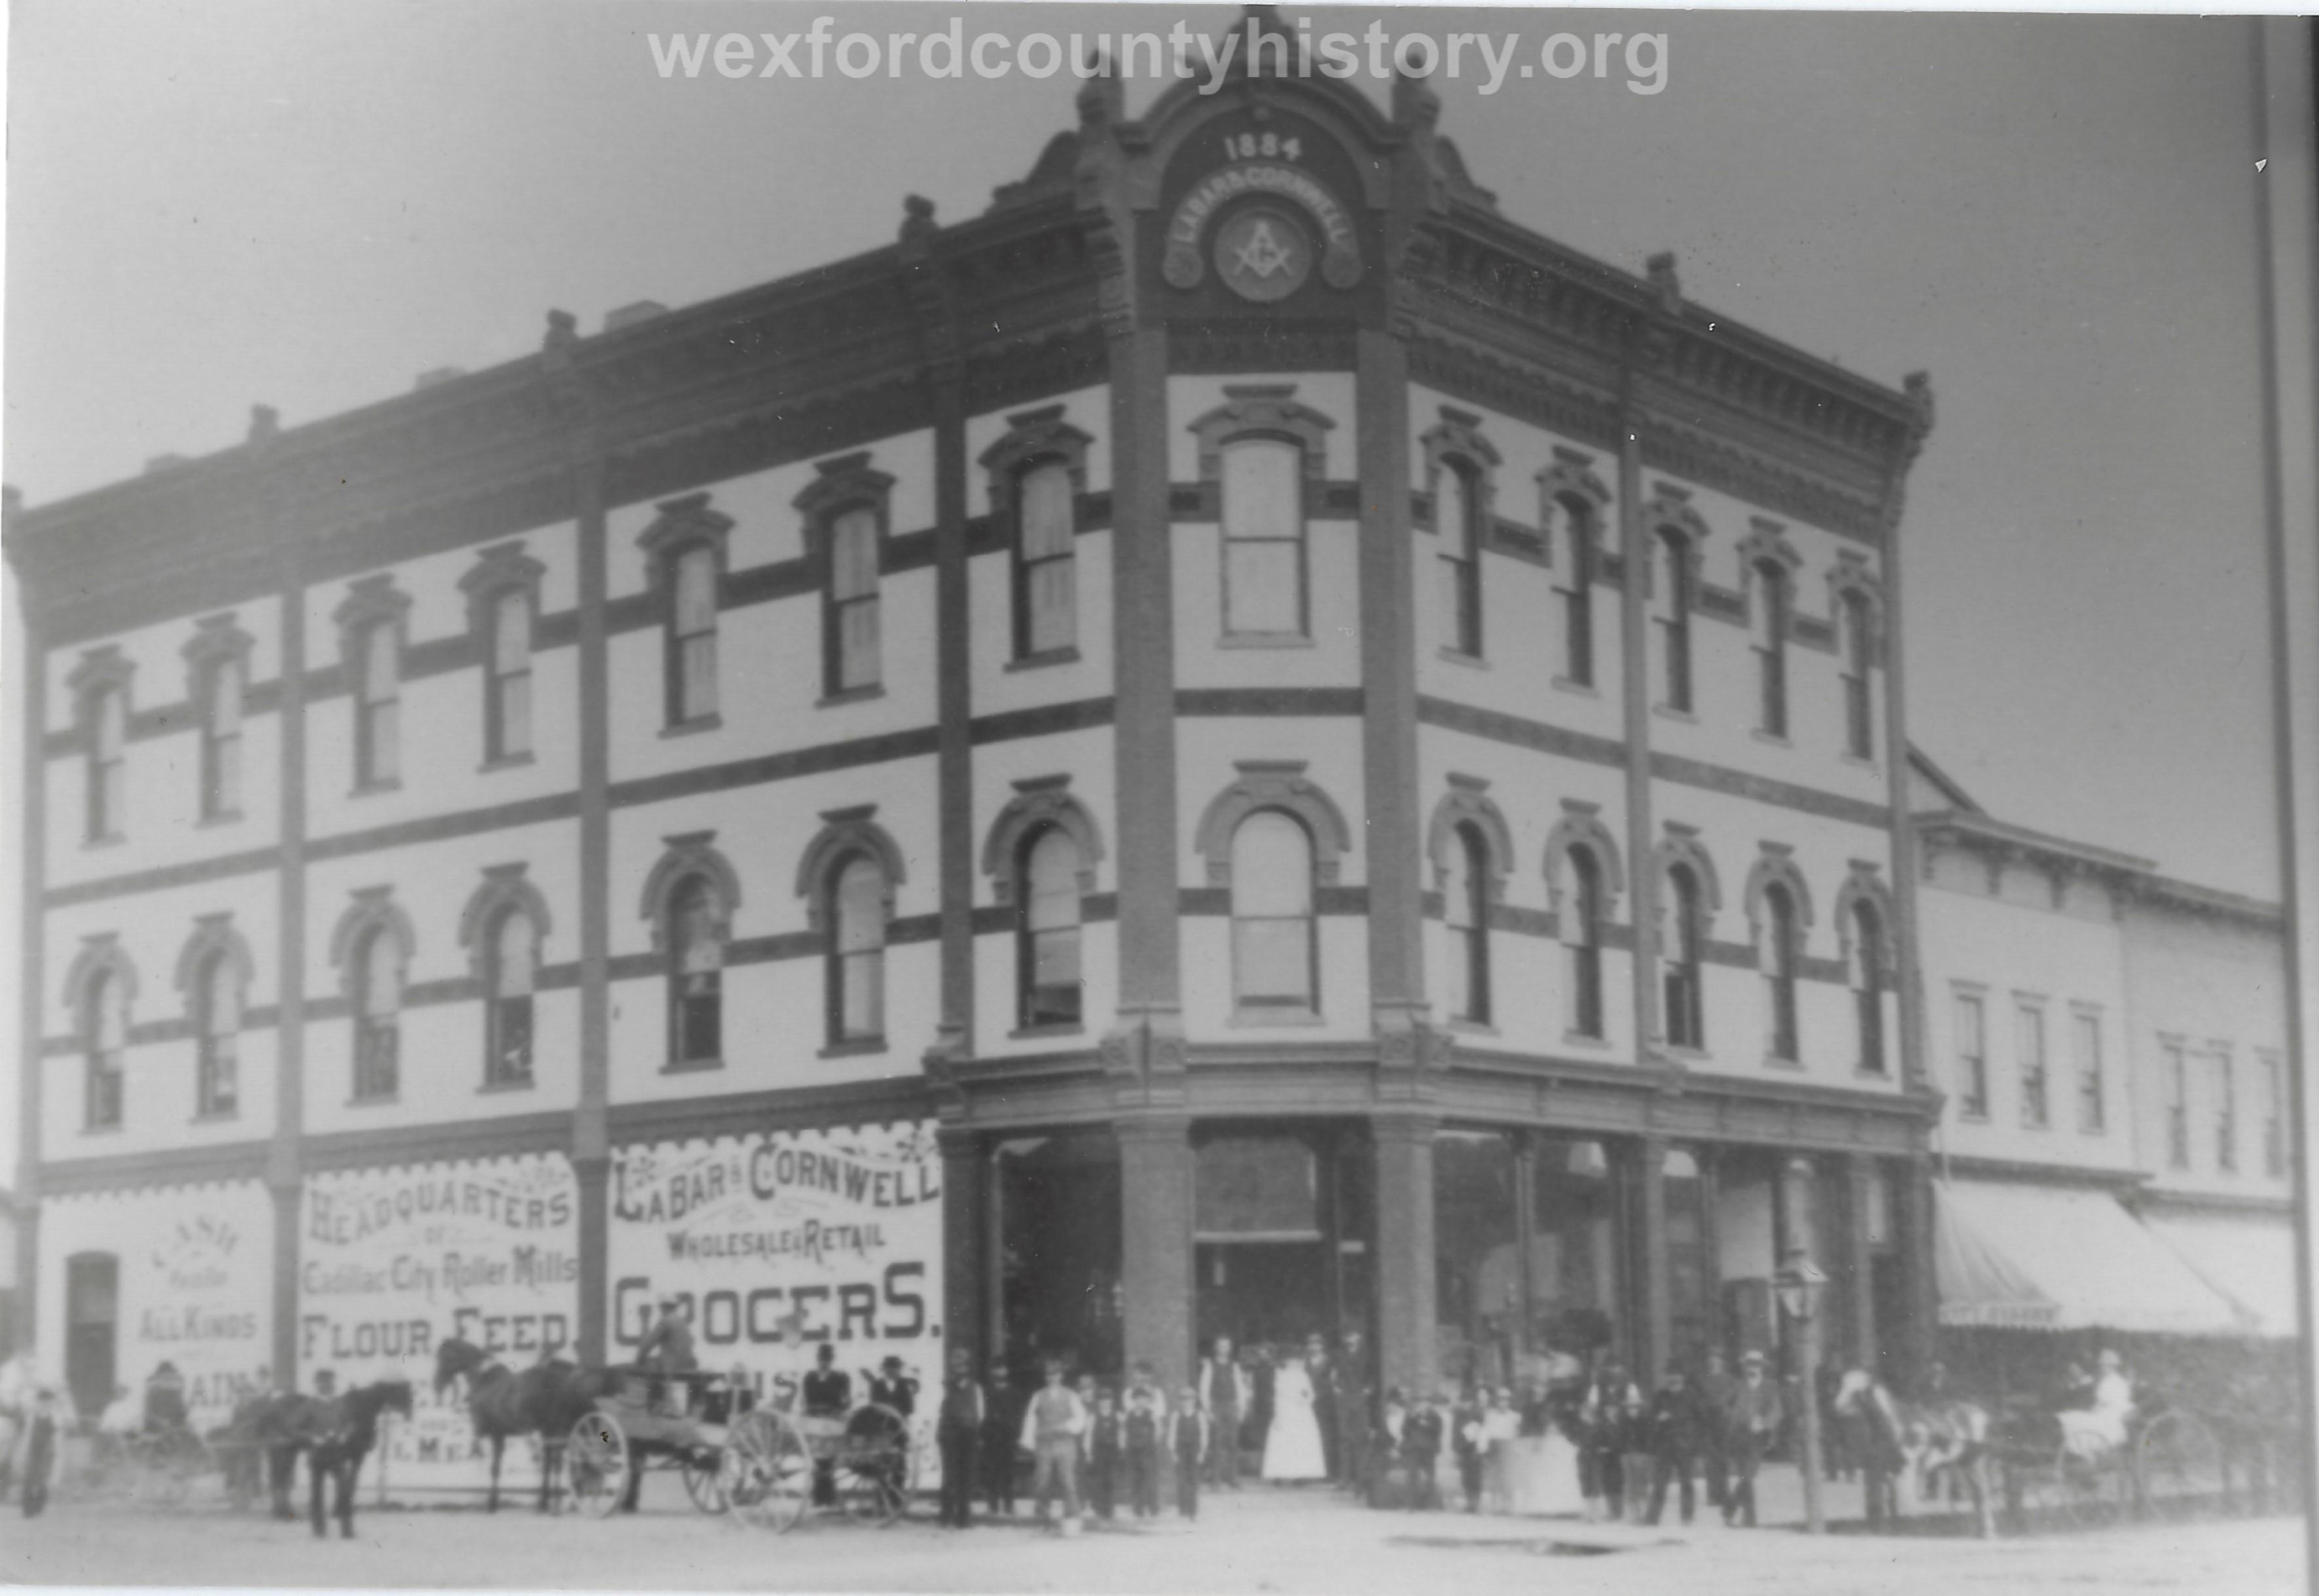 La Bar - Cornwell Building